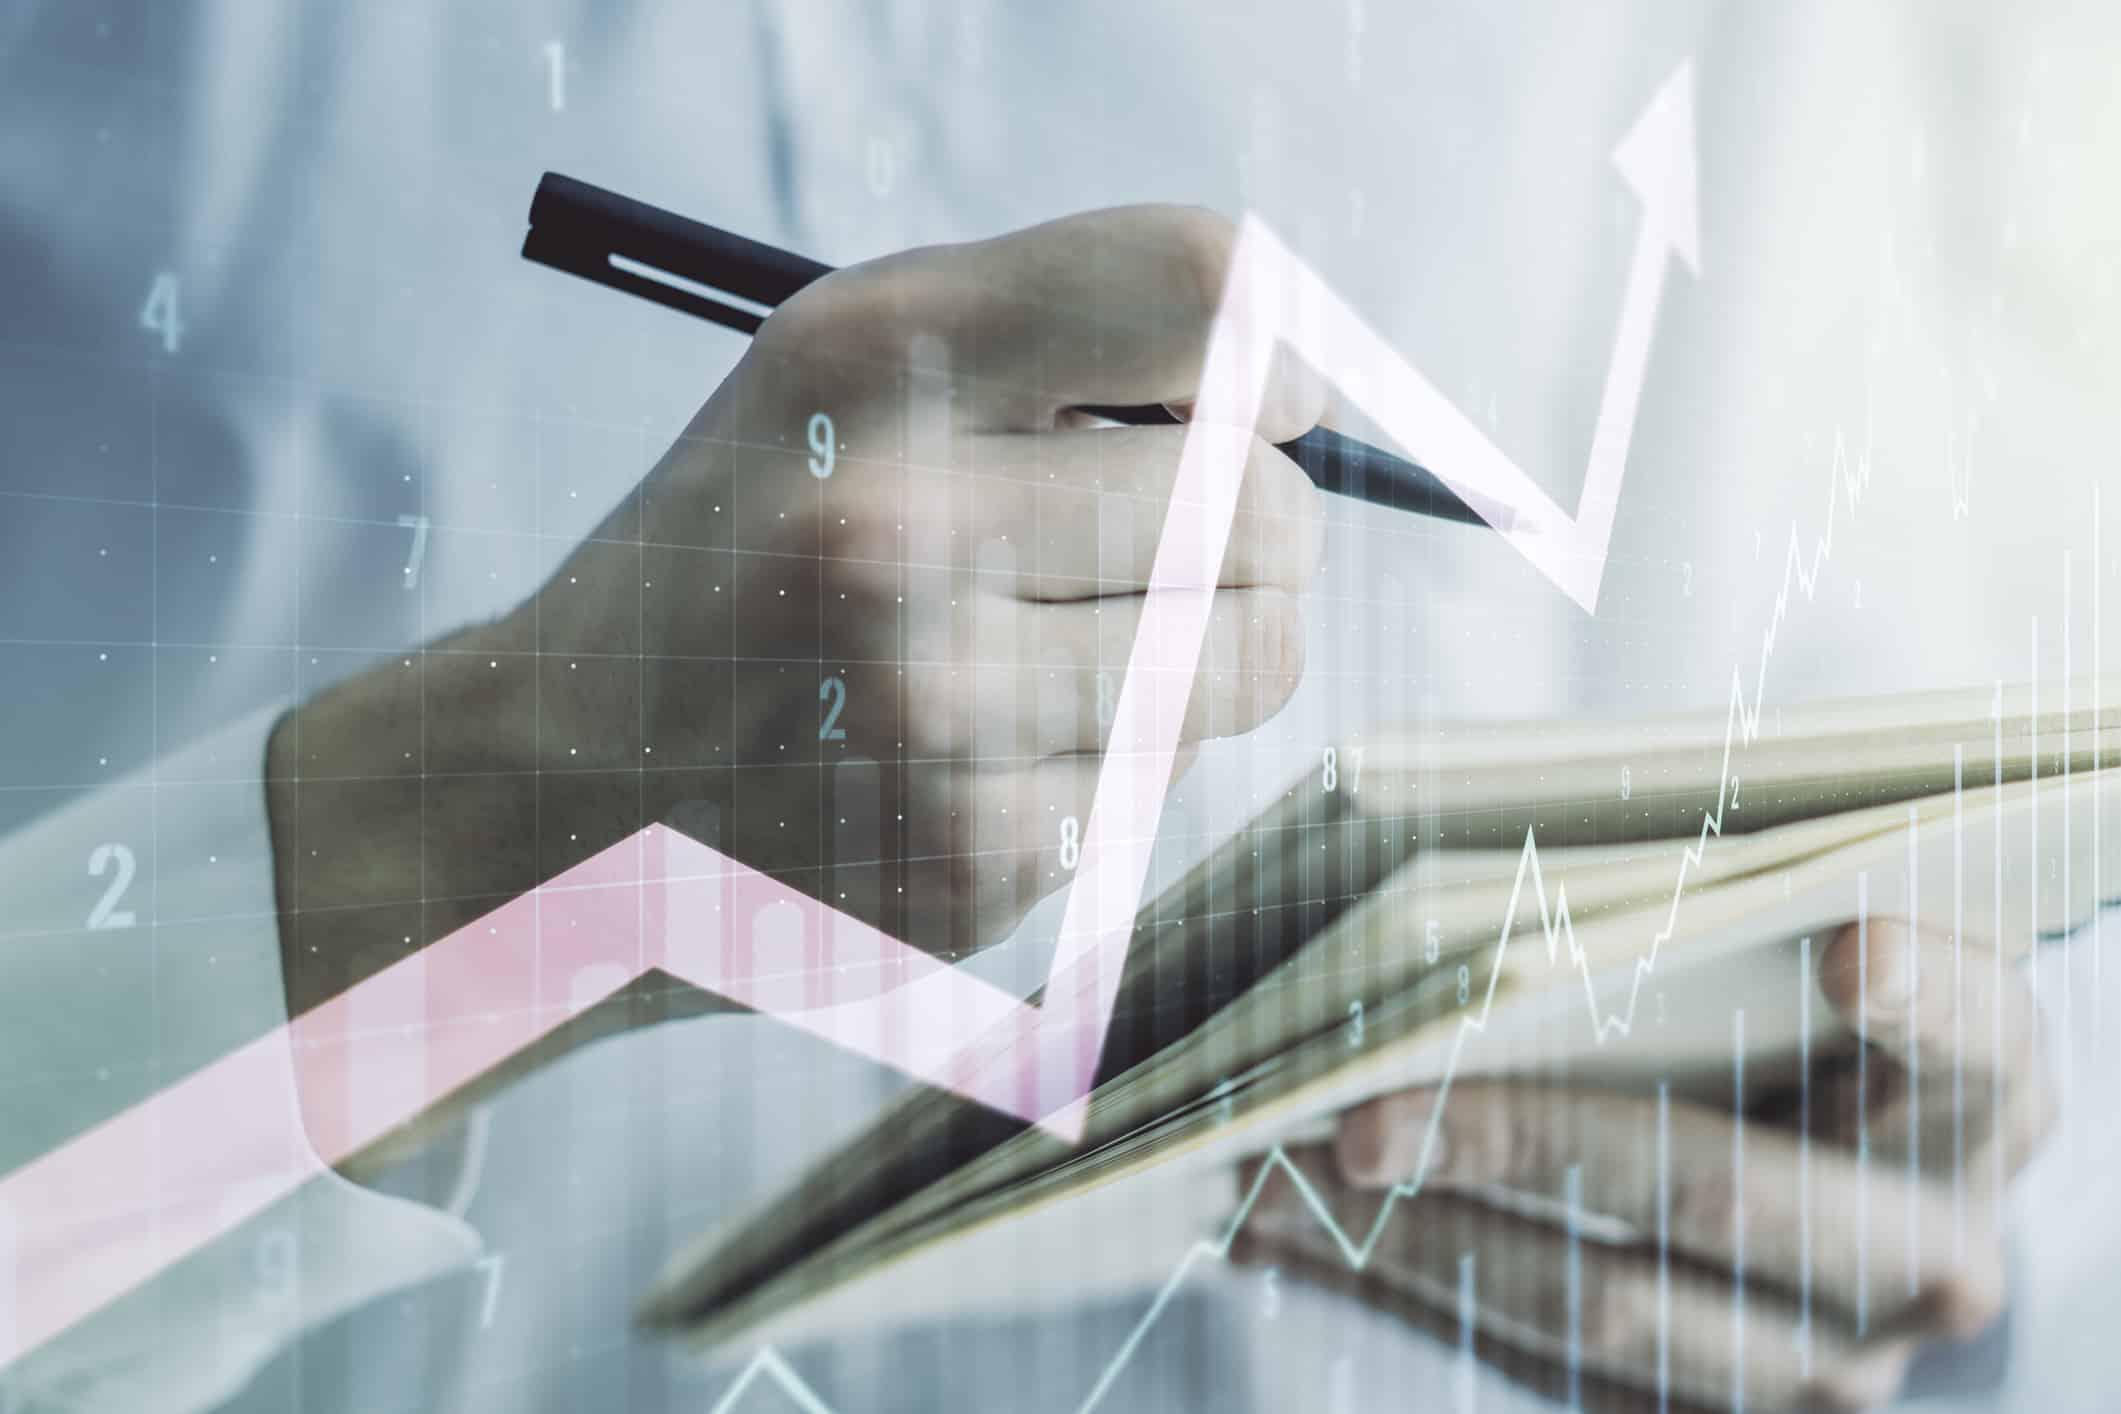 Rising market, bull market, analyse market, assess market